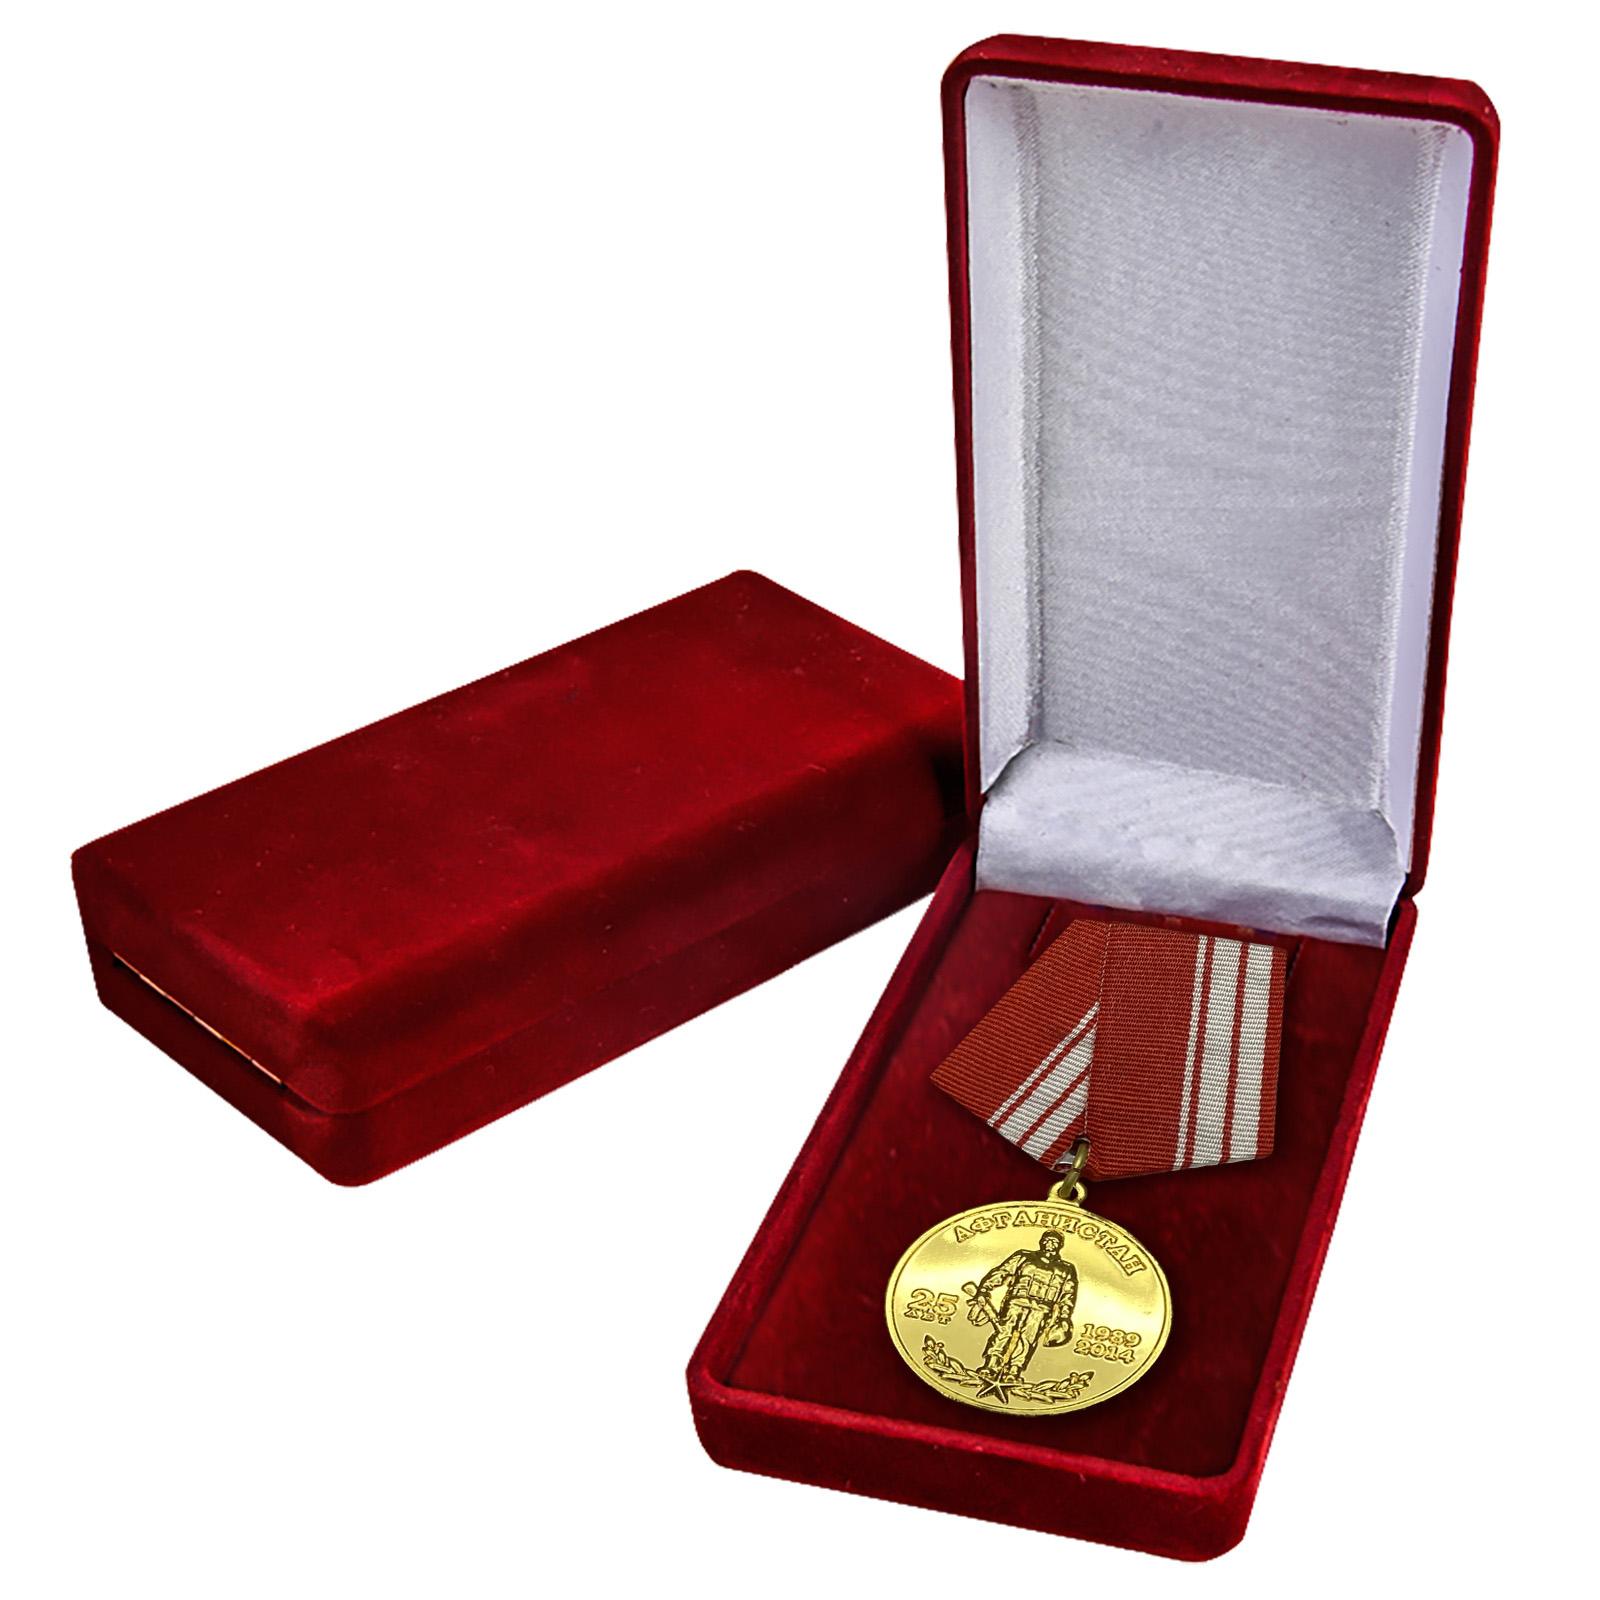 Медаль Афганистан 25 лет 1989 2014 - в бархатном фктляре